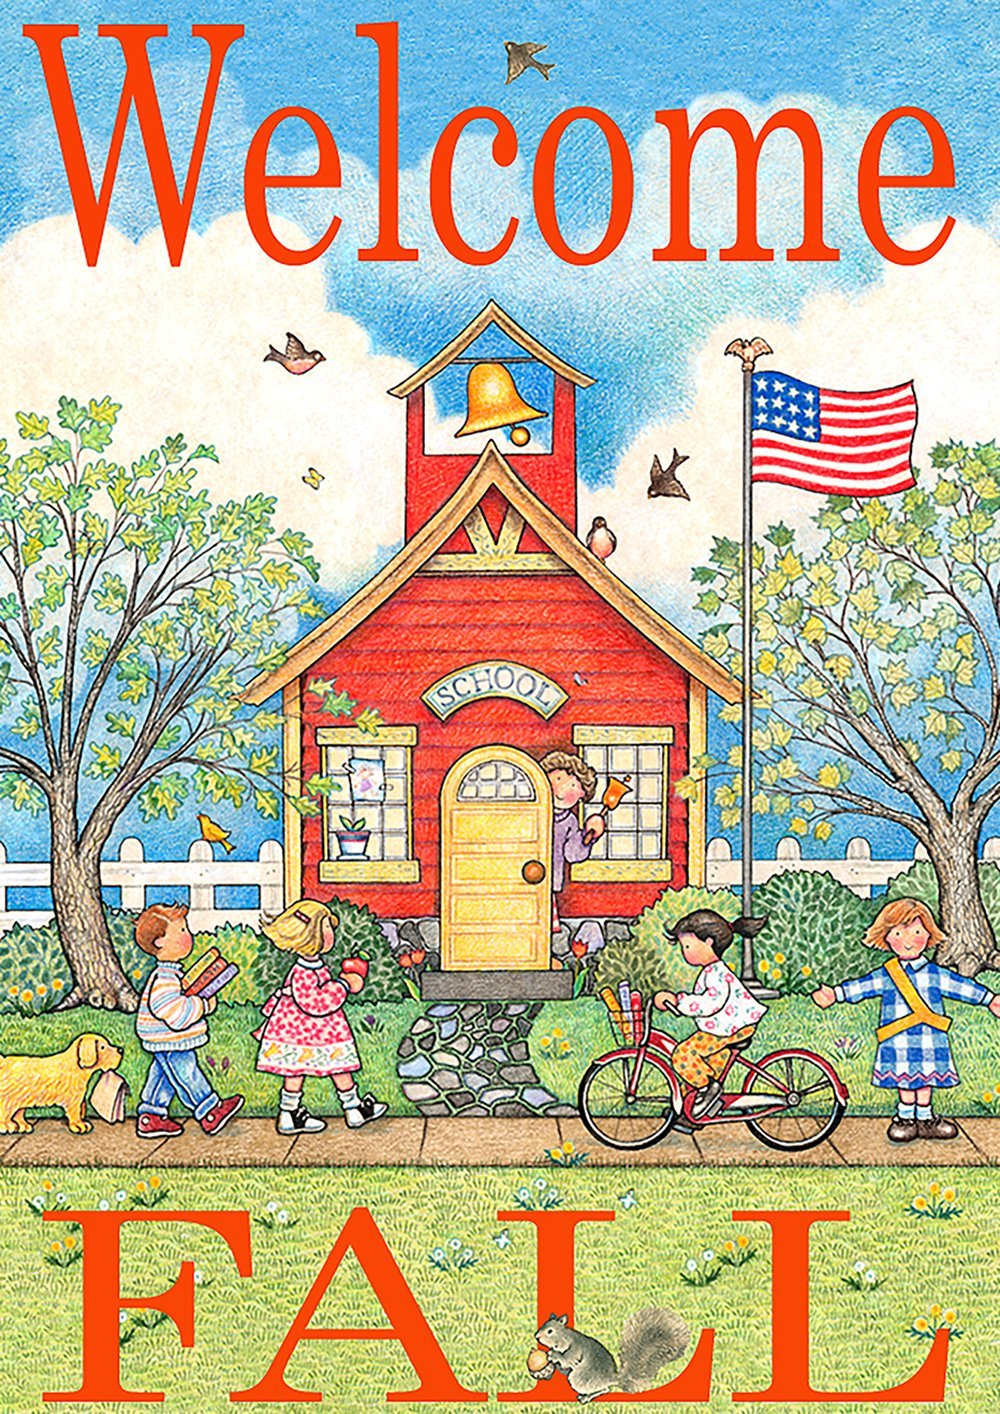 Toland Home Garden 1012193 Schoolhouse Welcome Decorative Fall Autumn Back to School Teacher House Flag, 28 x 40, Multicolor